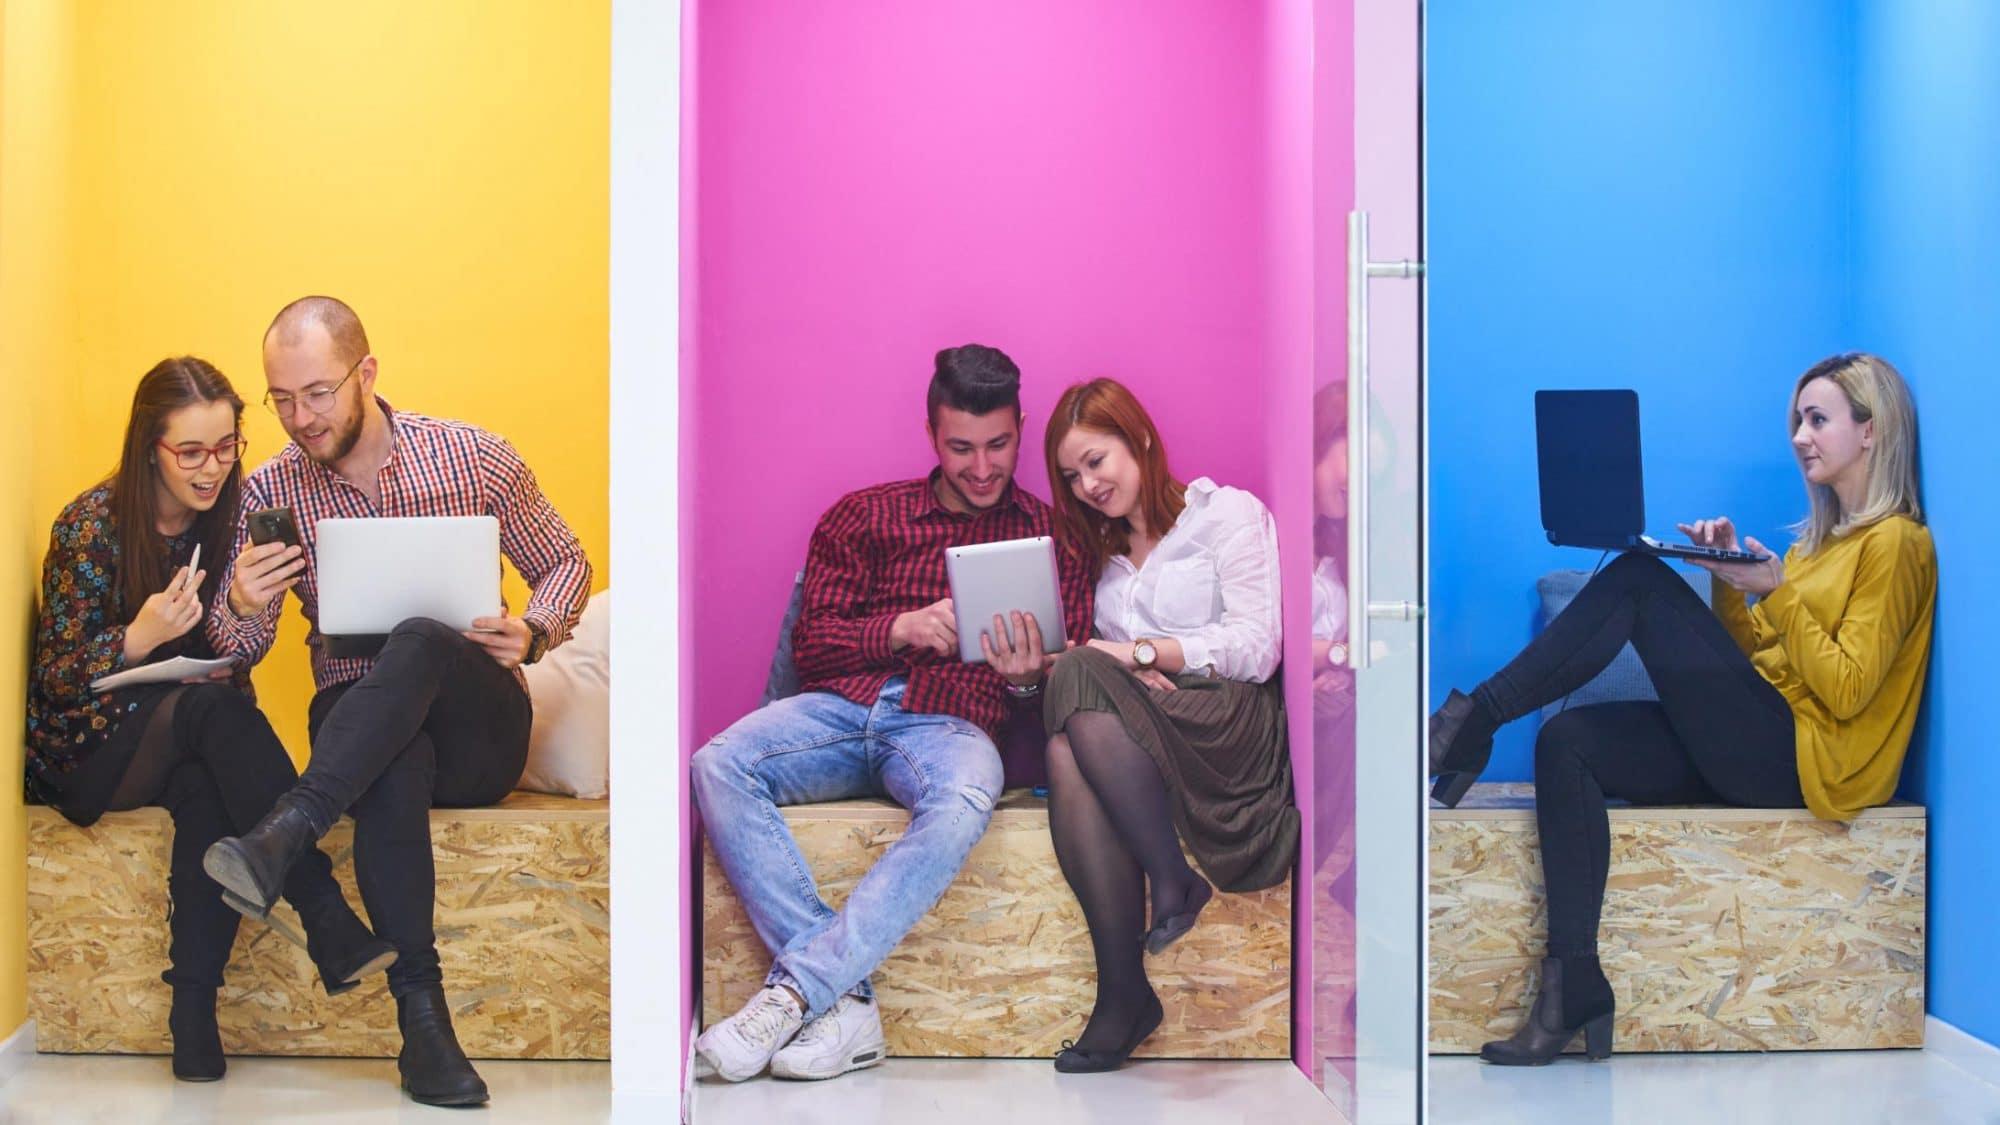 Digitaler Content: Menschen mit Laptops und Smartphones